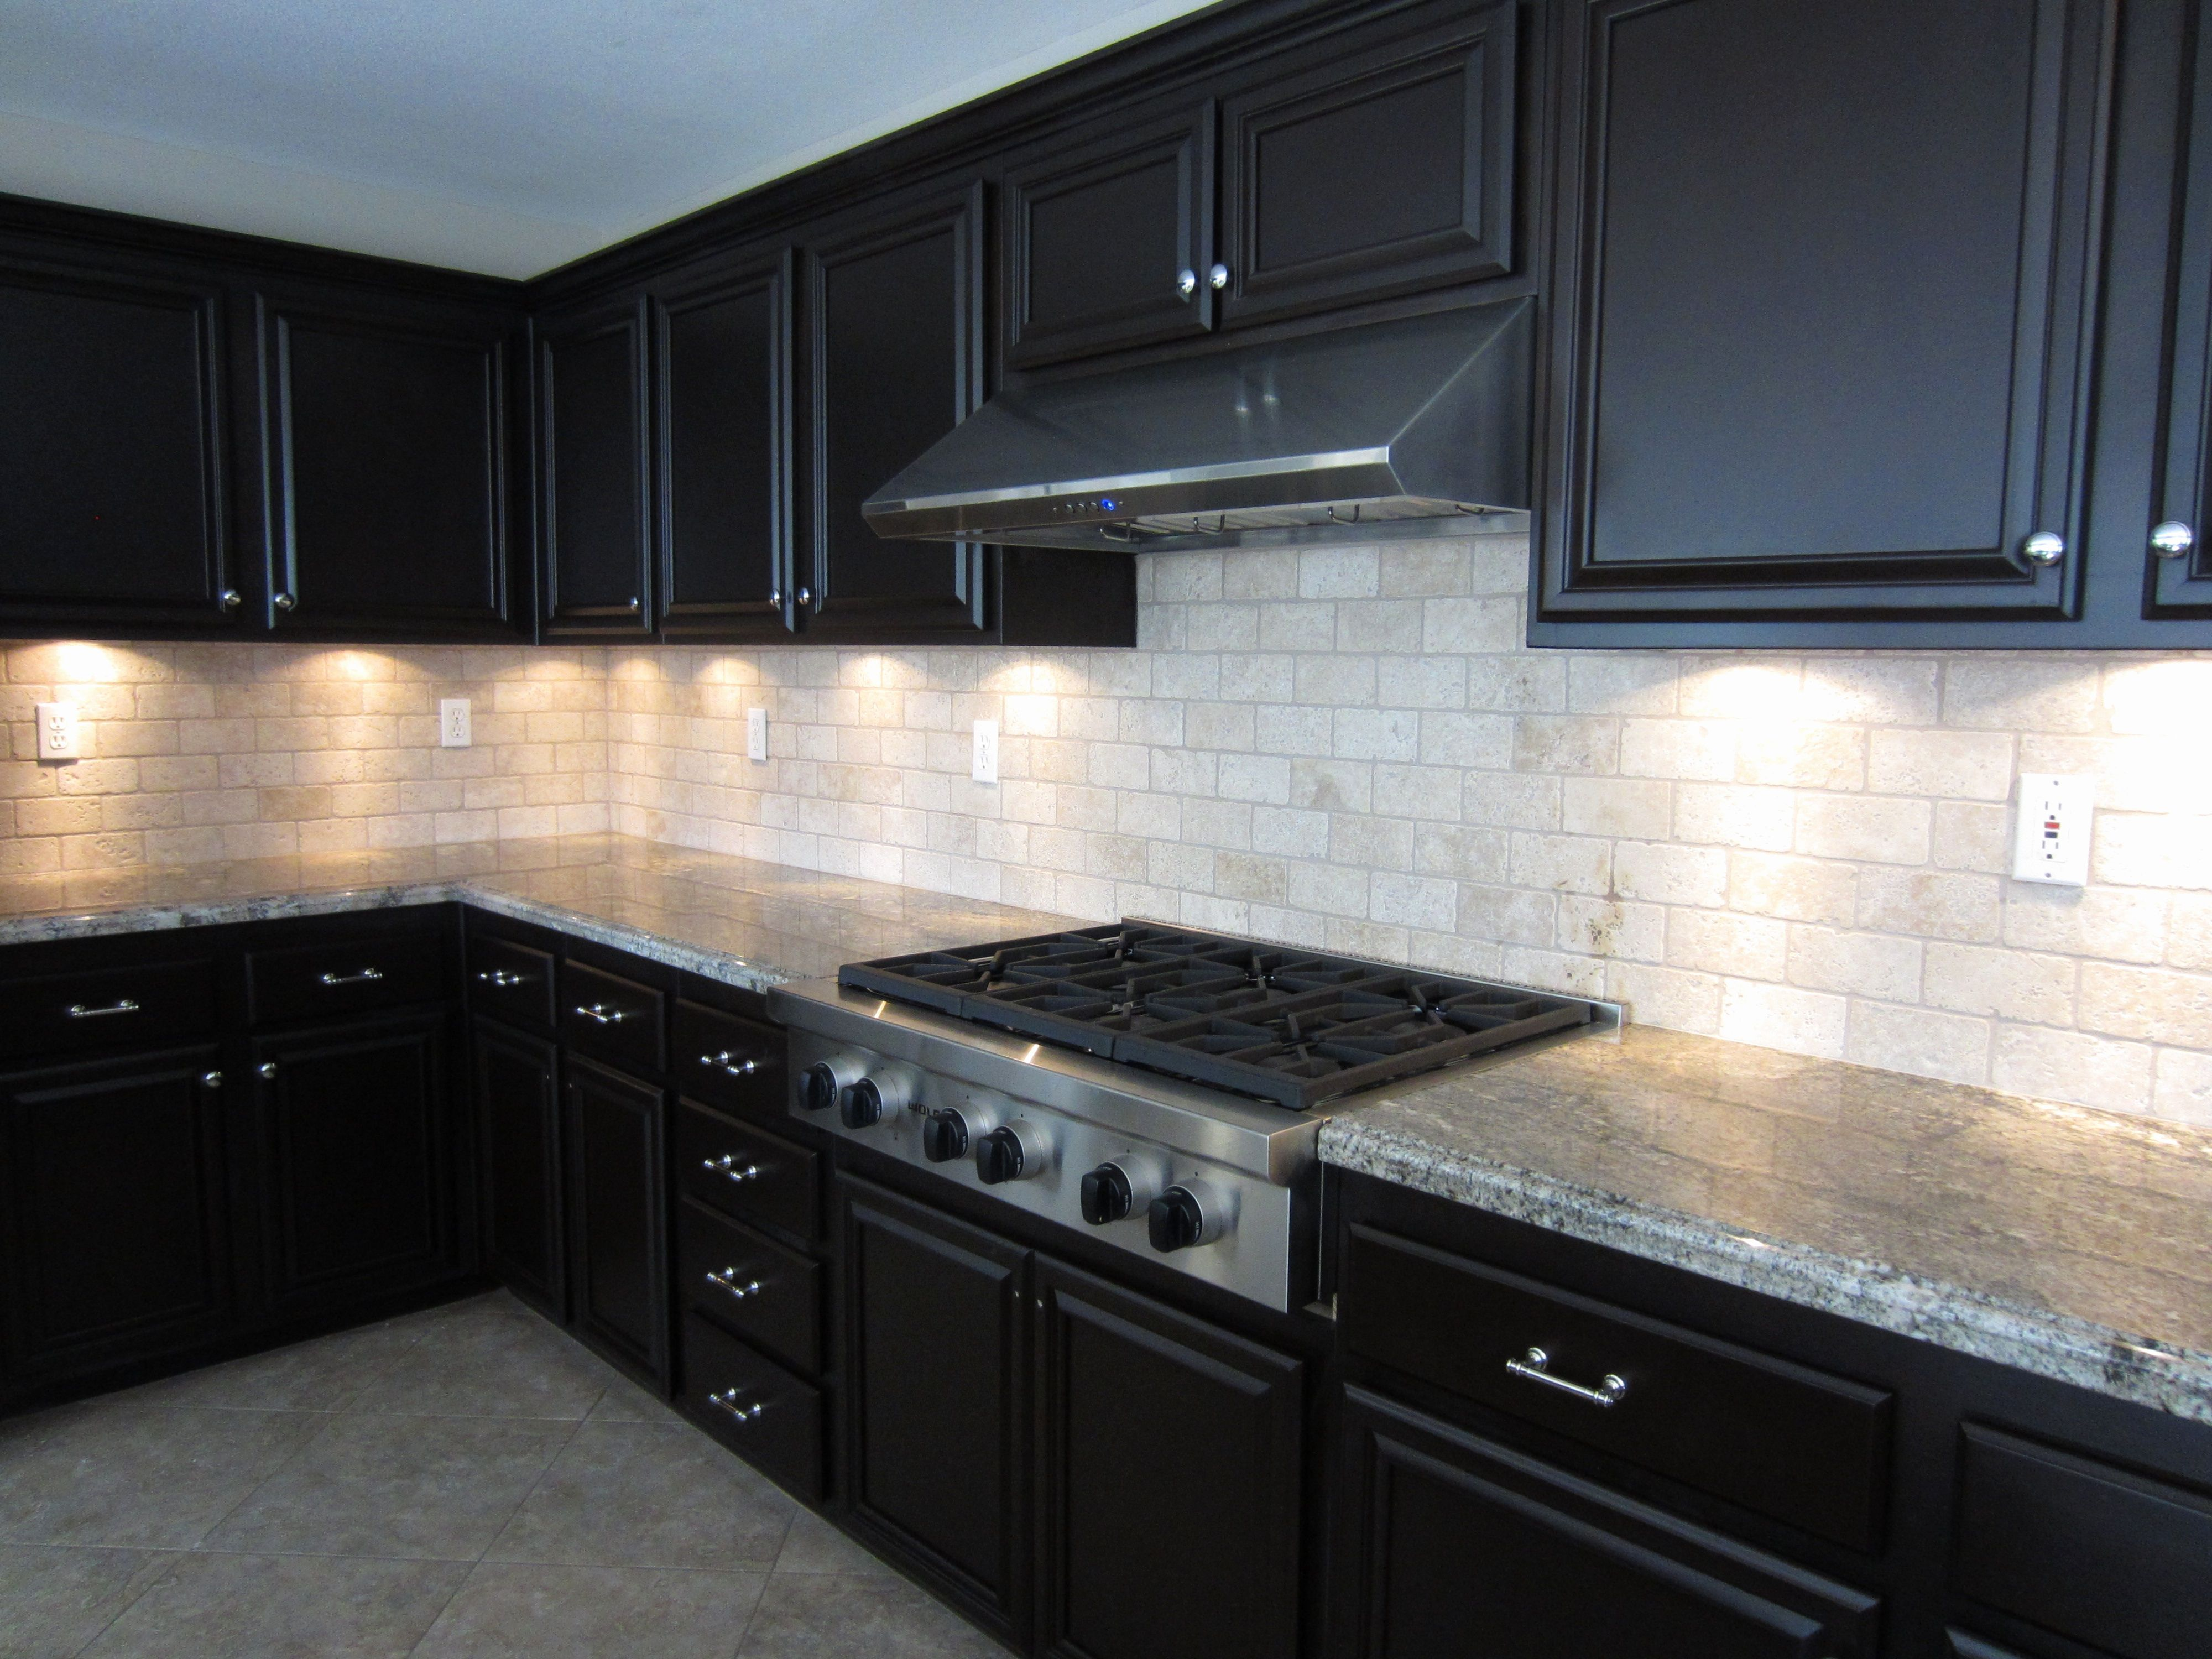 Dark Kitchen Cabinets Backsplash Ideas Beautiful Cool For Unique Kitchencabinetsbacksplash